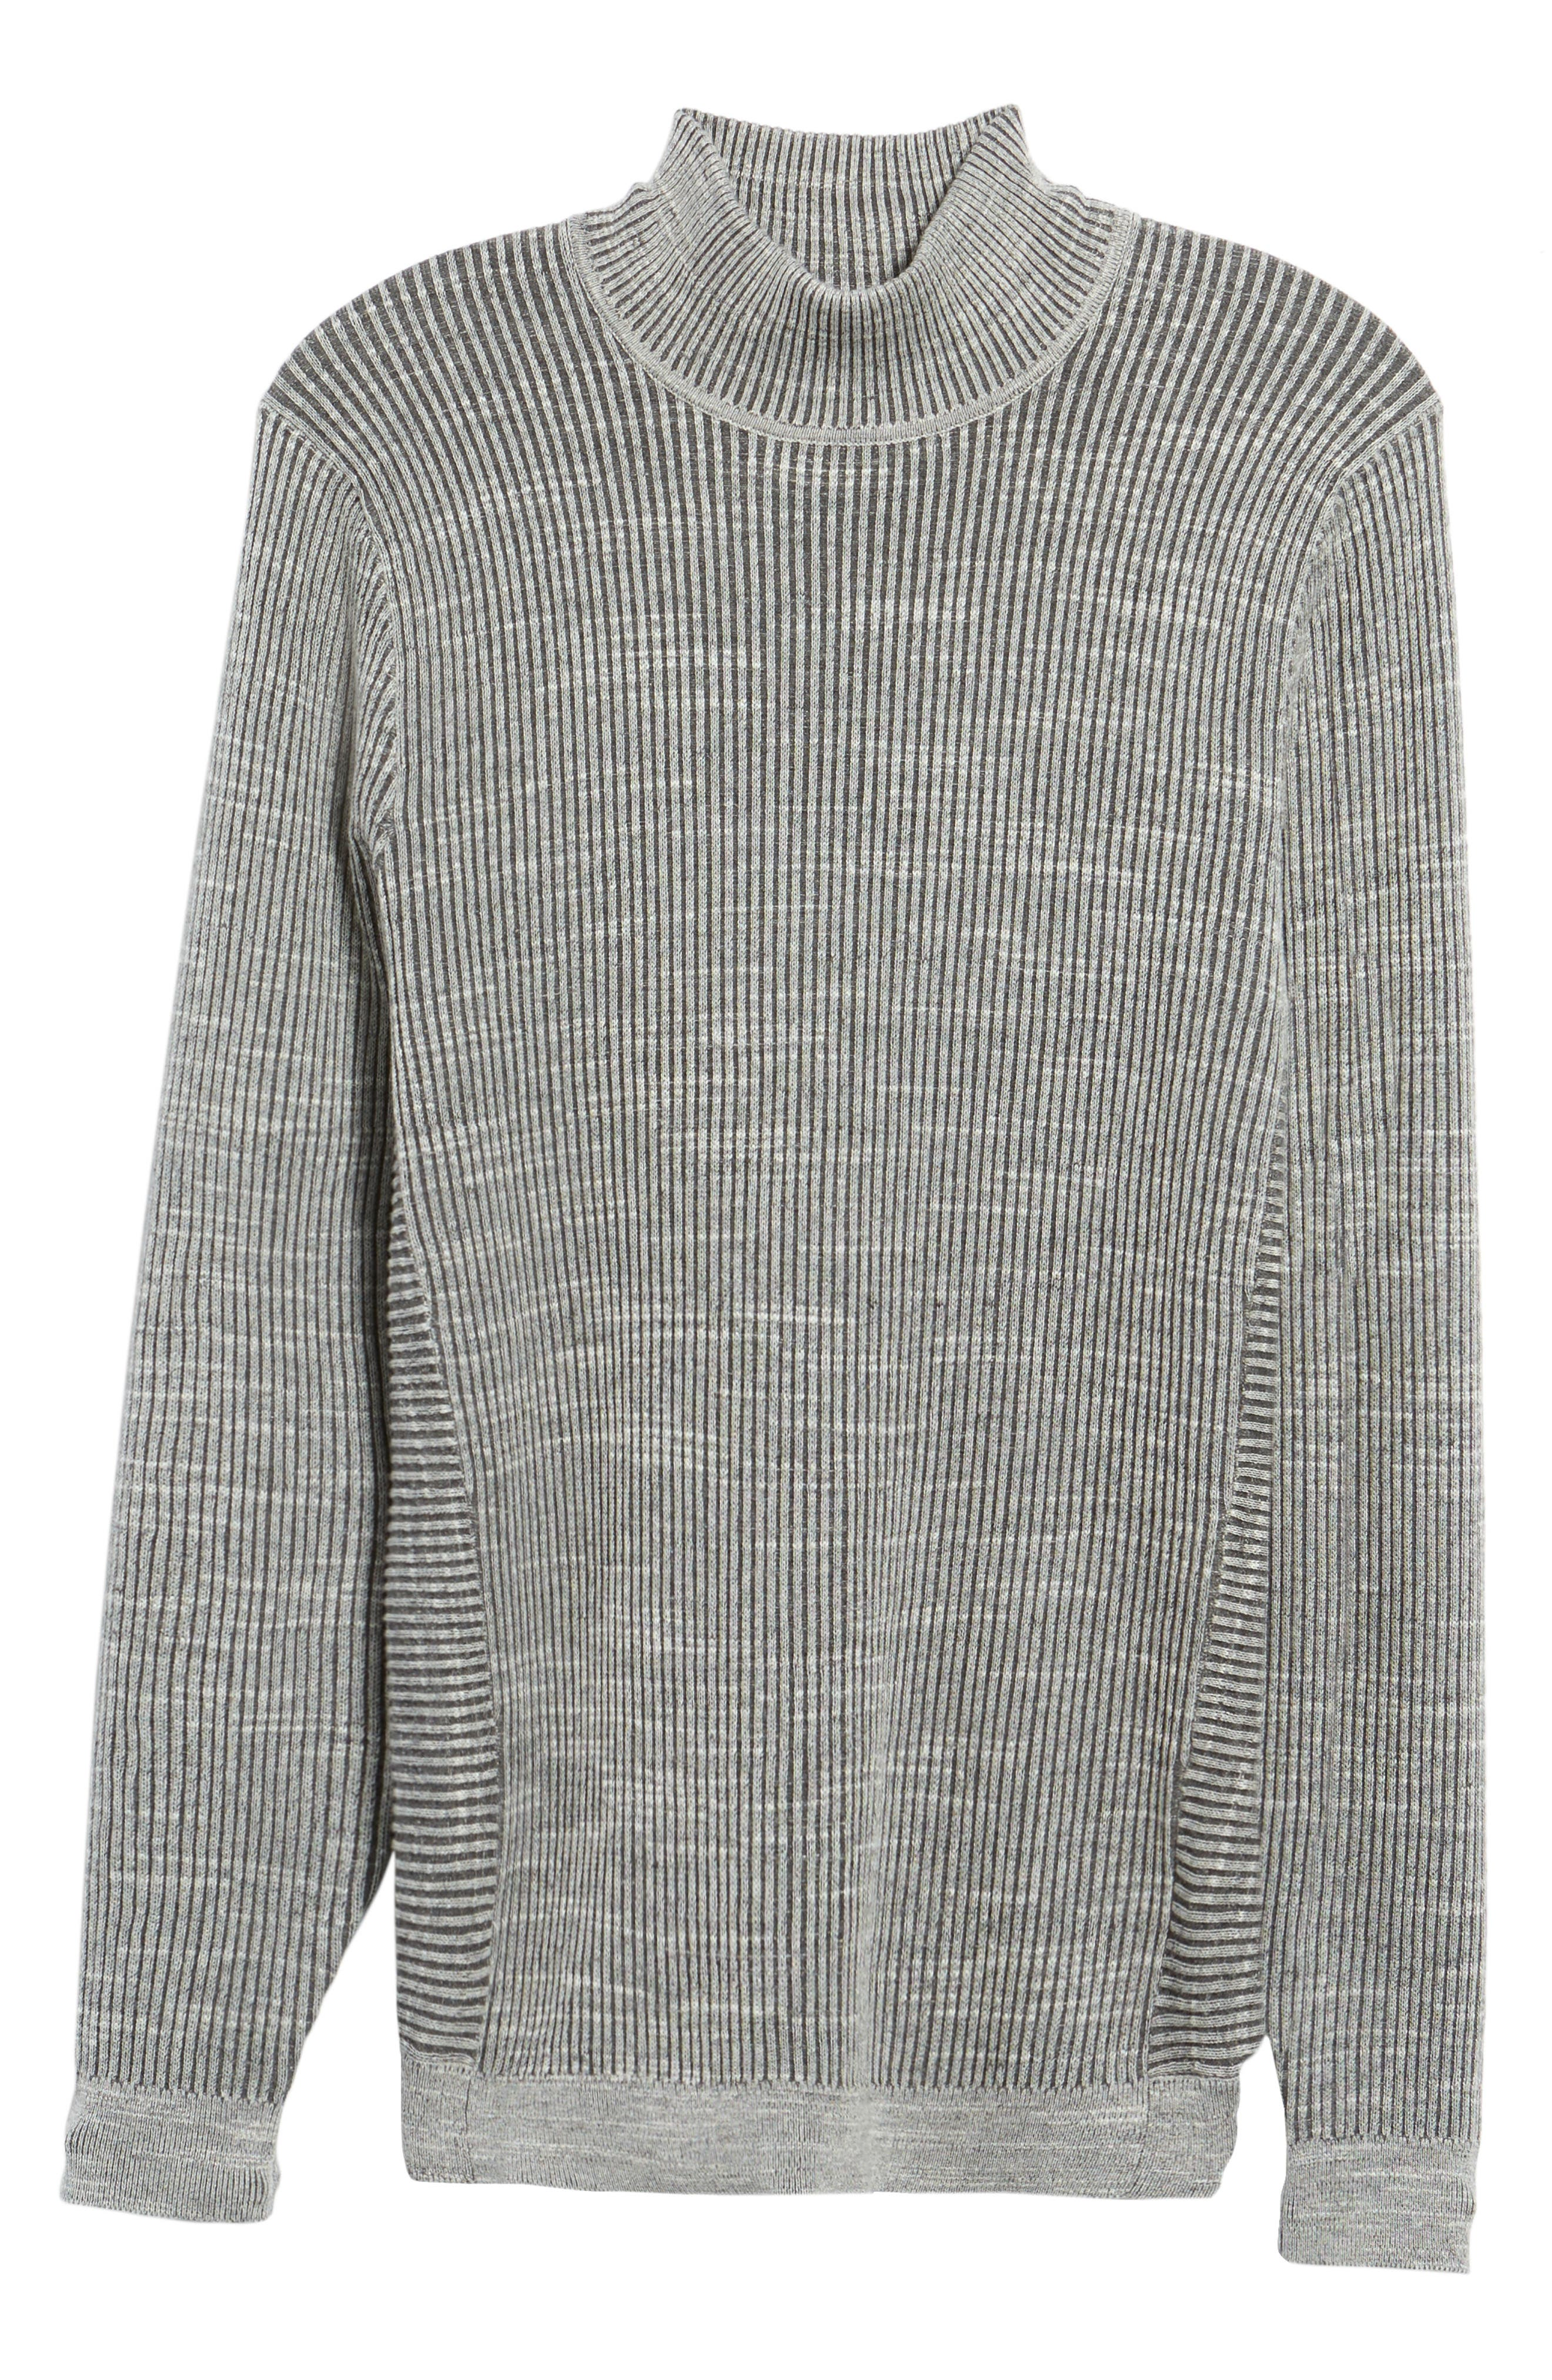 Mock Neck Sweater,                             Alternate thumbnail 6, color,                             Grey Dark Charcoal